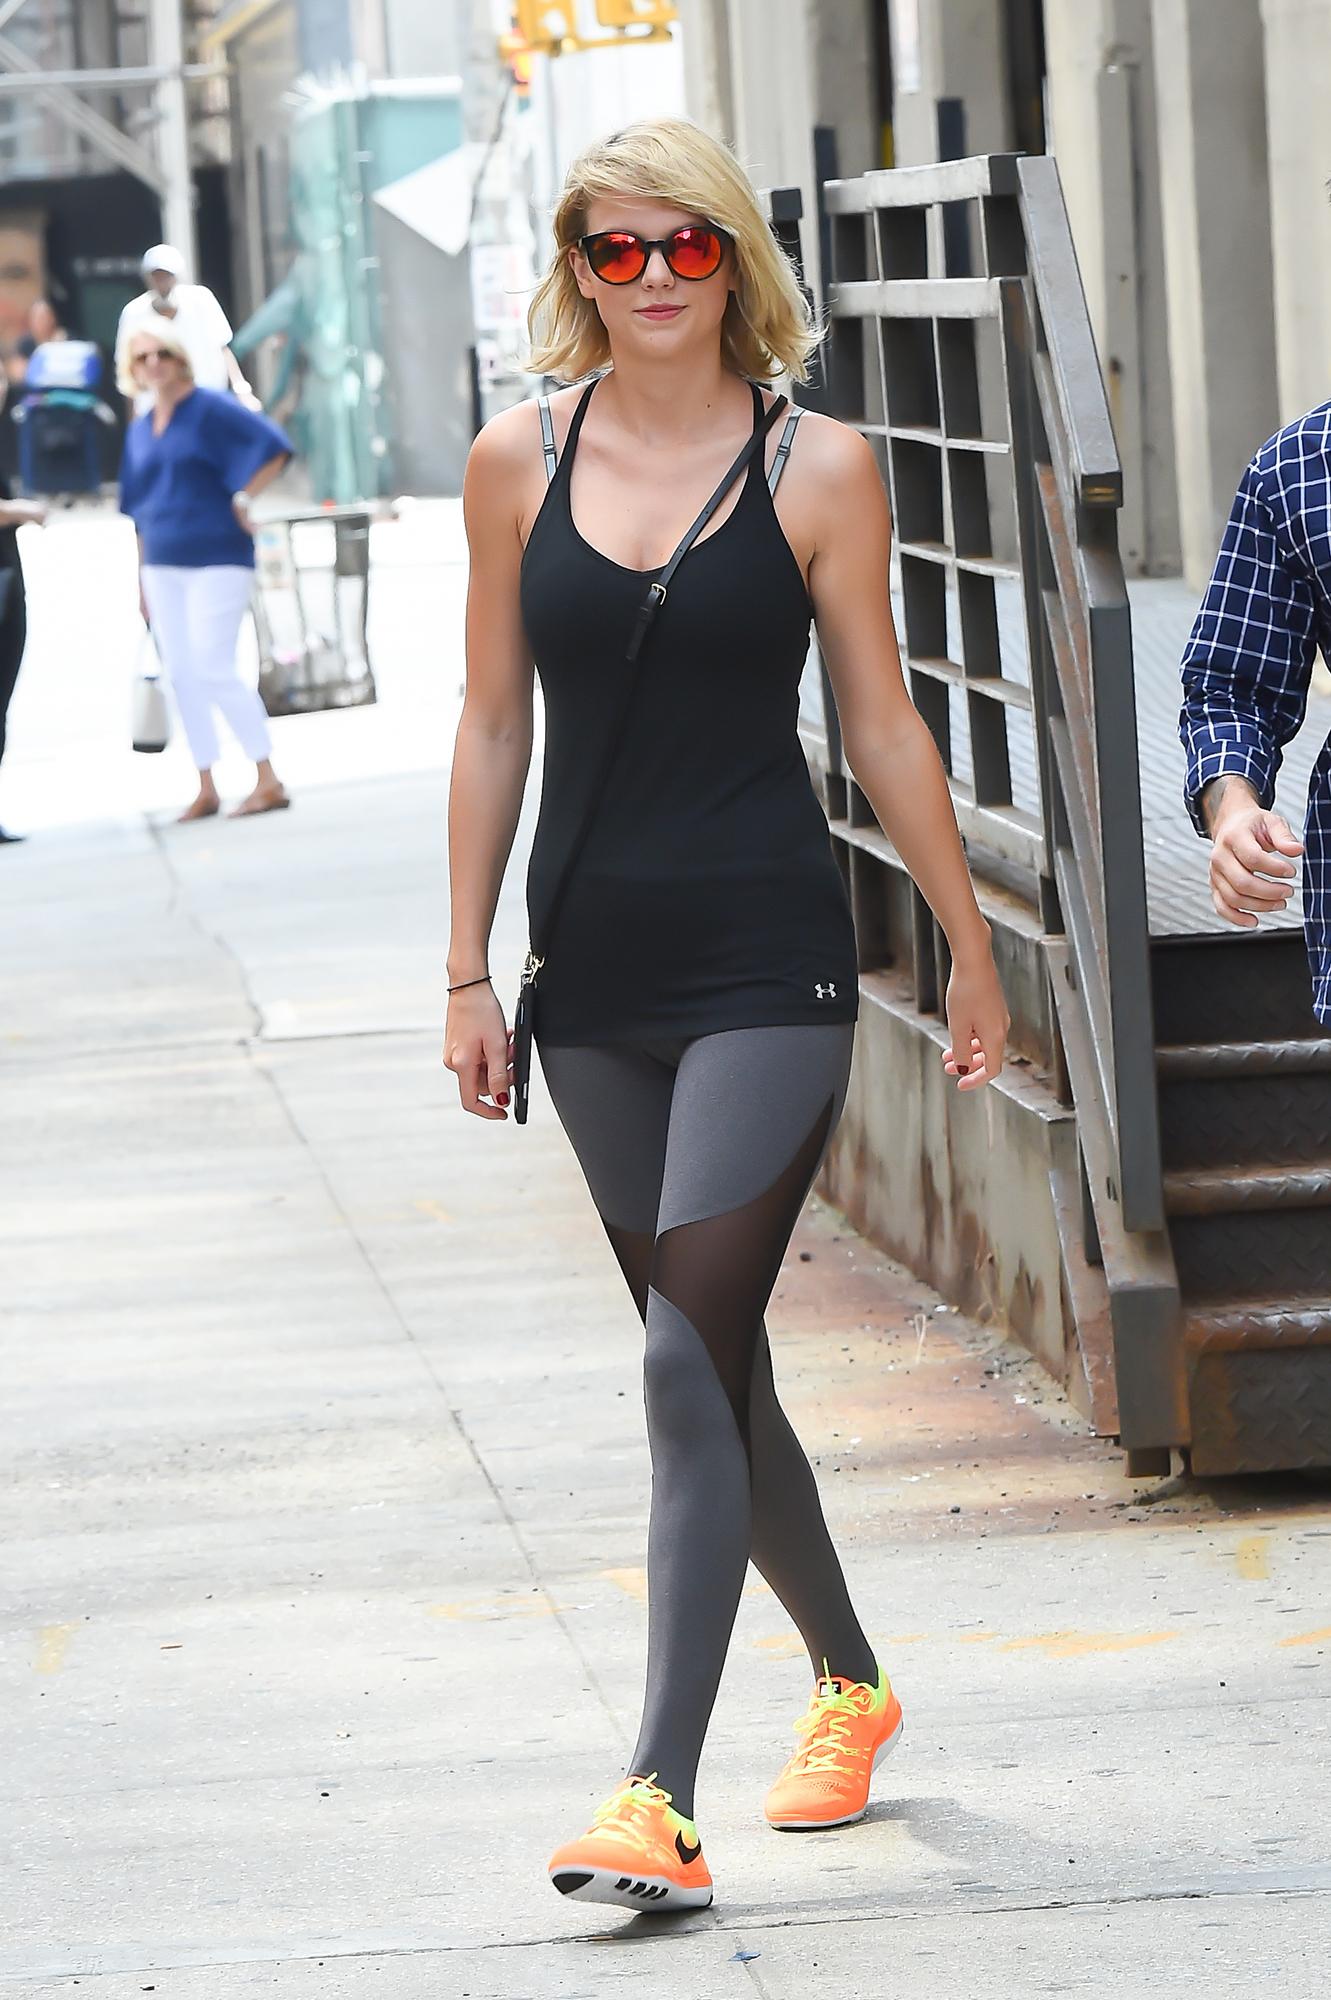 Cuota mensual Gobernador  Taylor Swift's Workout Styles, Leggings: Details